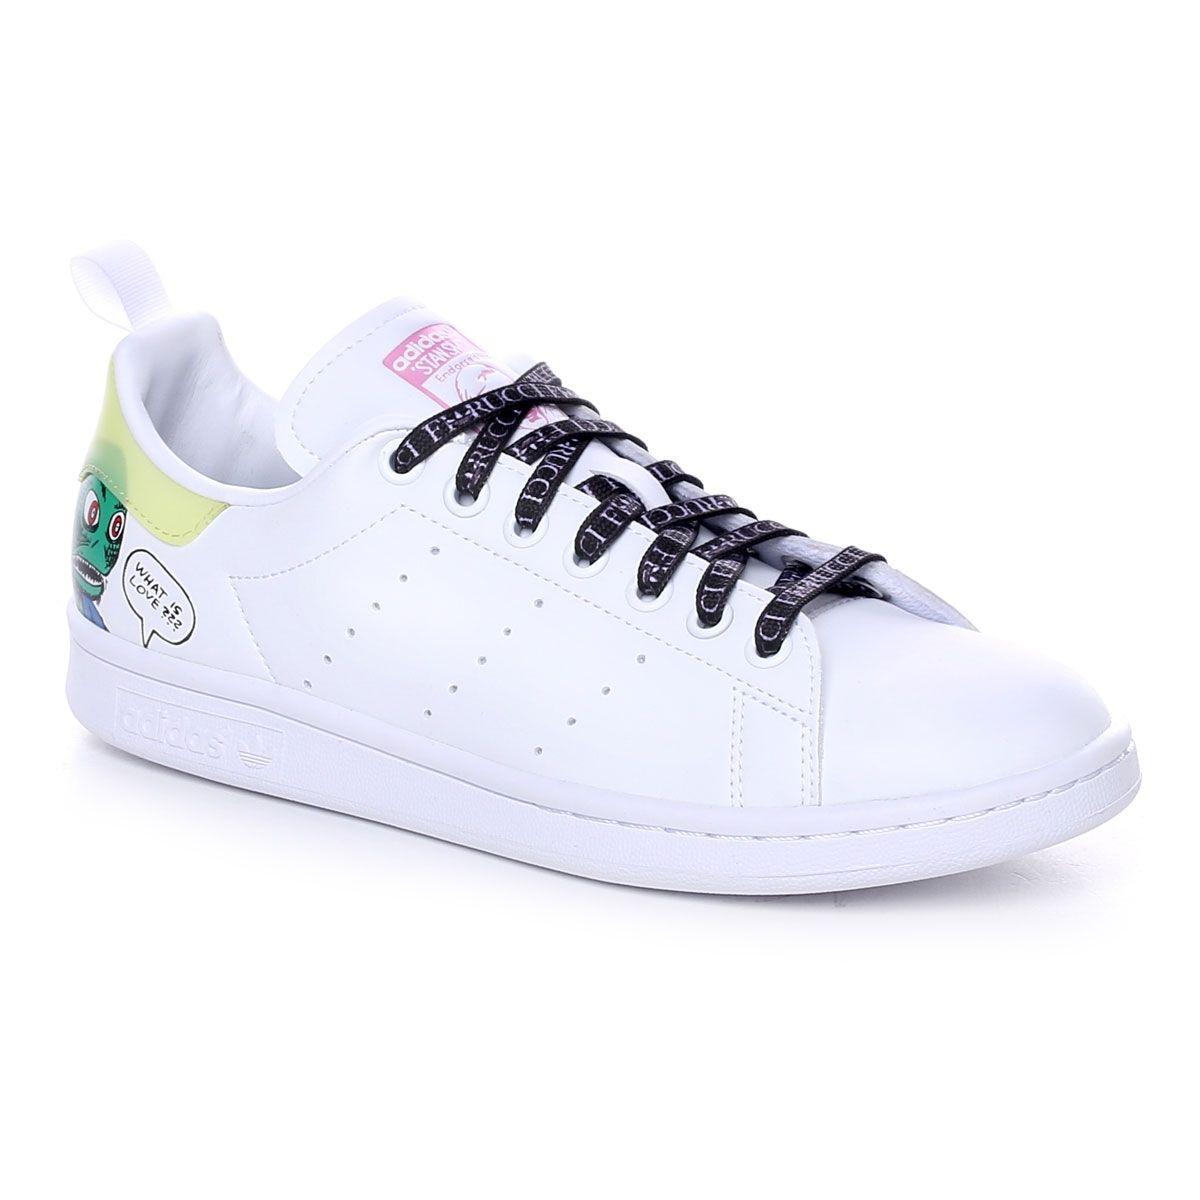 Adidas Originals Stan Smith W Fiorucci